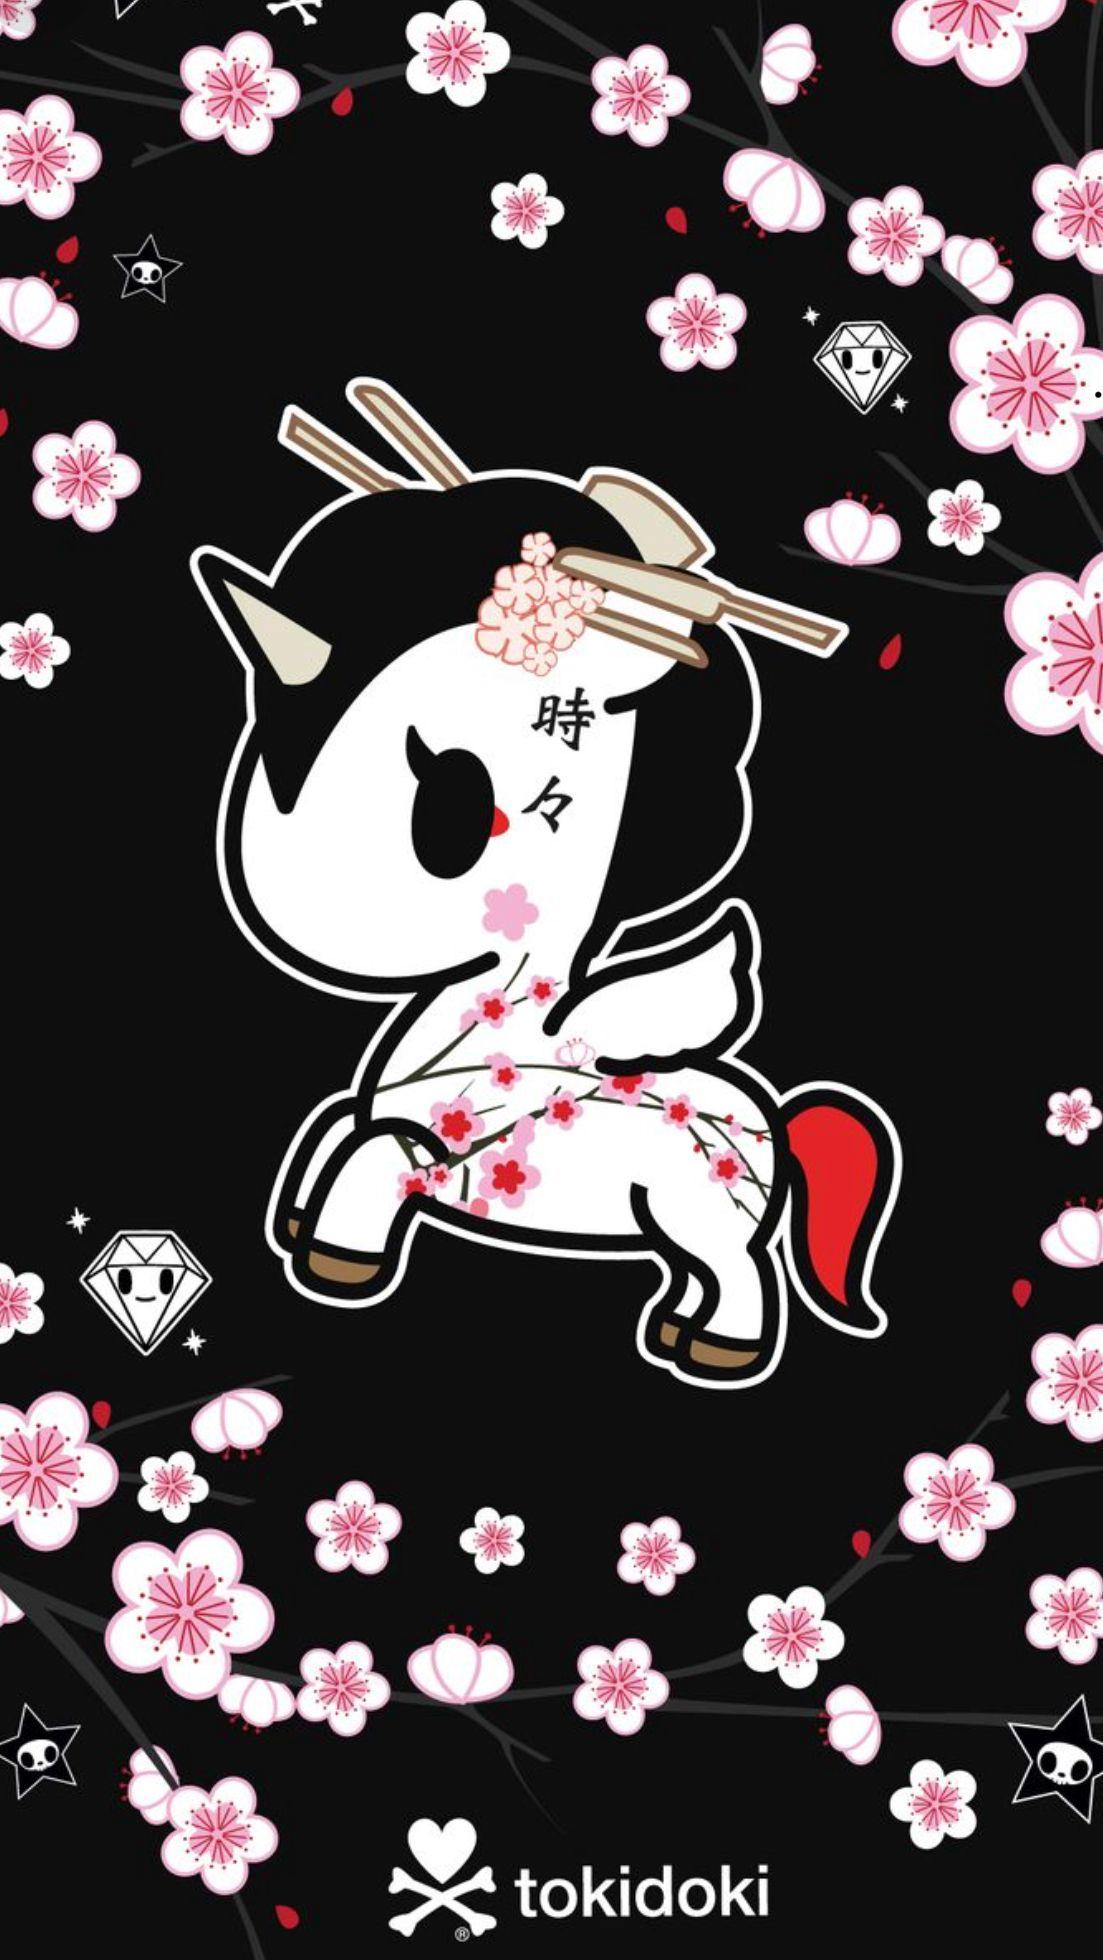 Tokidoki Unicorn Wallpaper Kawaii Unicorn Kawaii Wallpaper